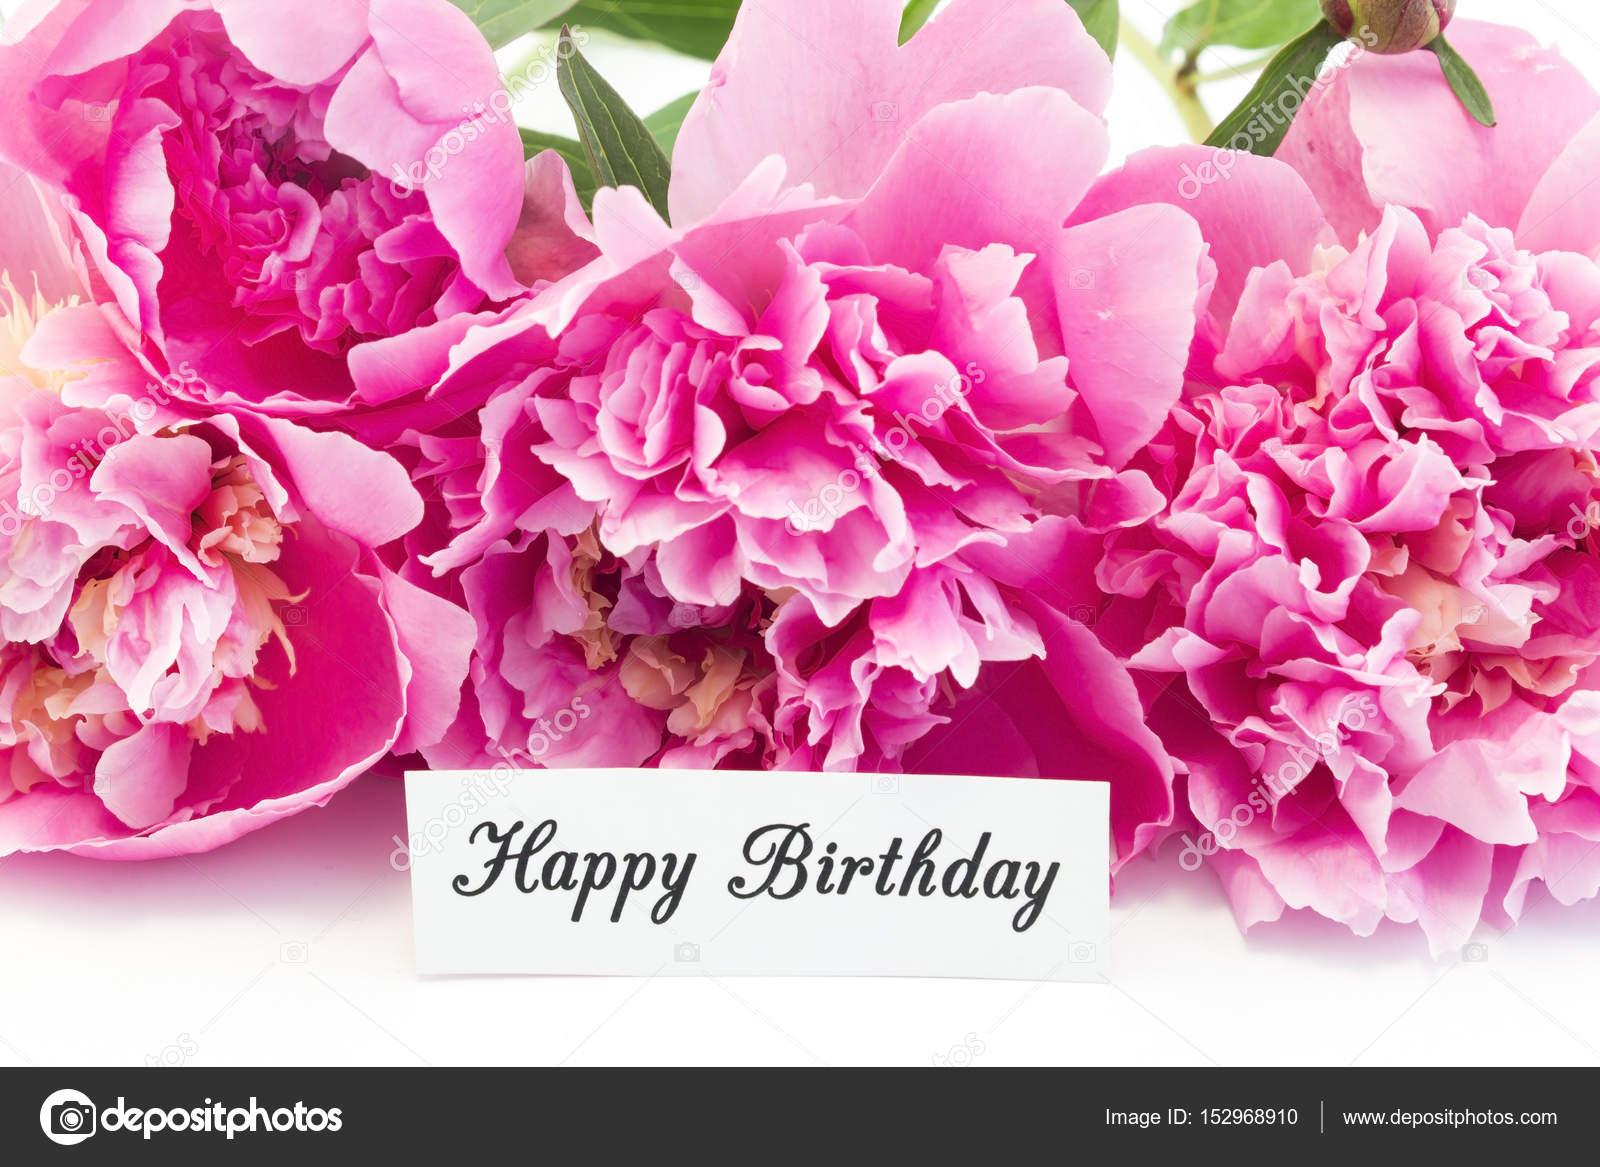 Mazzo Di Fiori Happy Birthday.Happy Birthday Card With Bouquet Of Pink Peonies Stock Photo